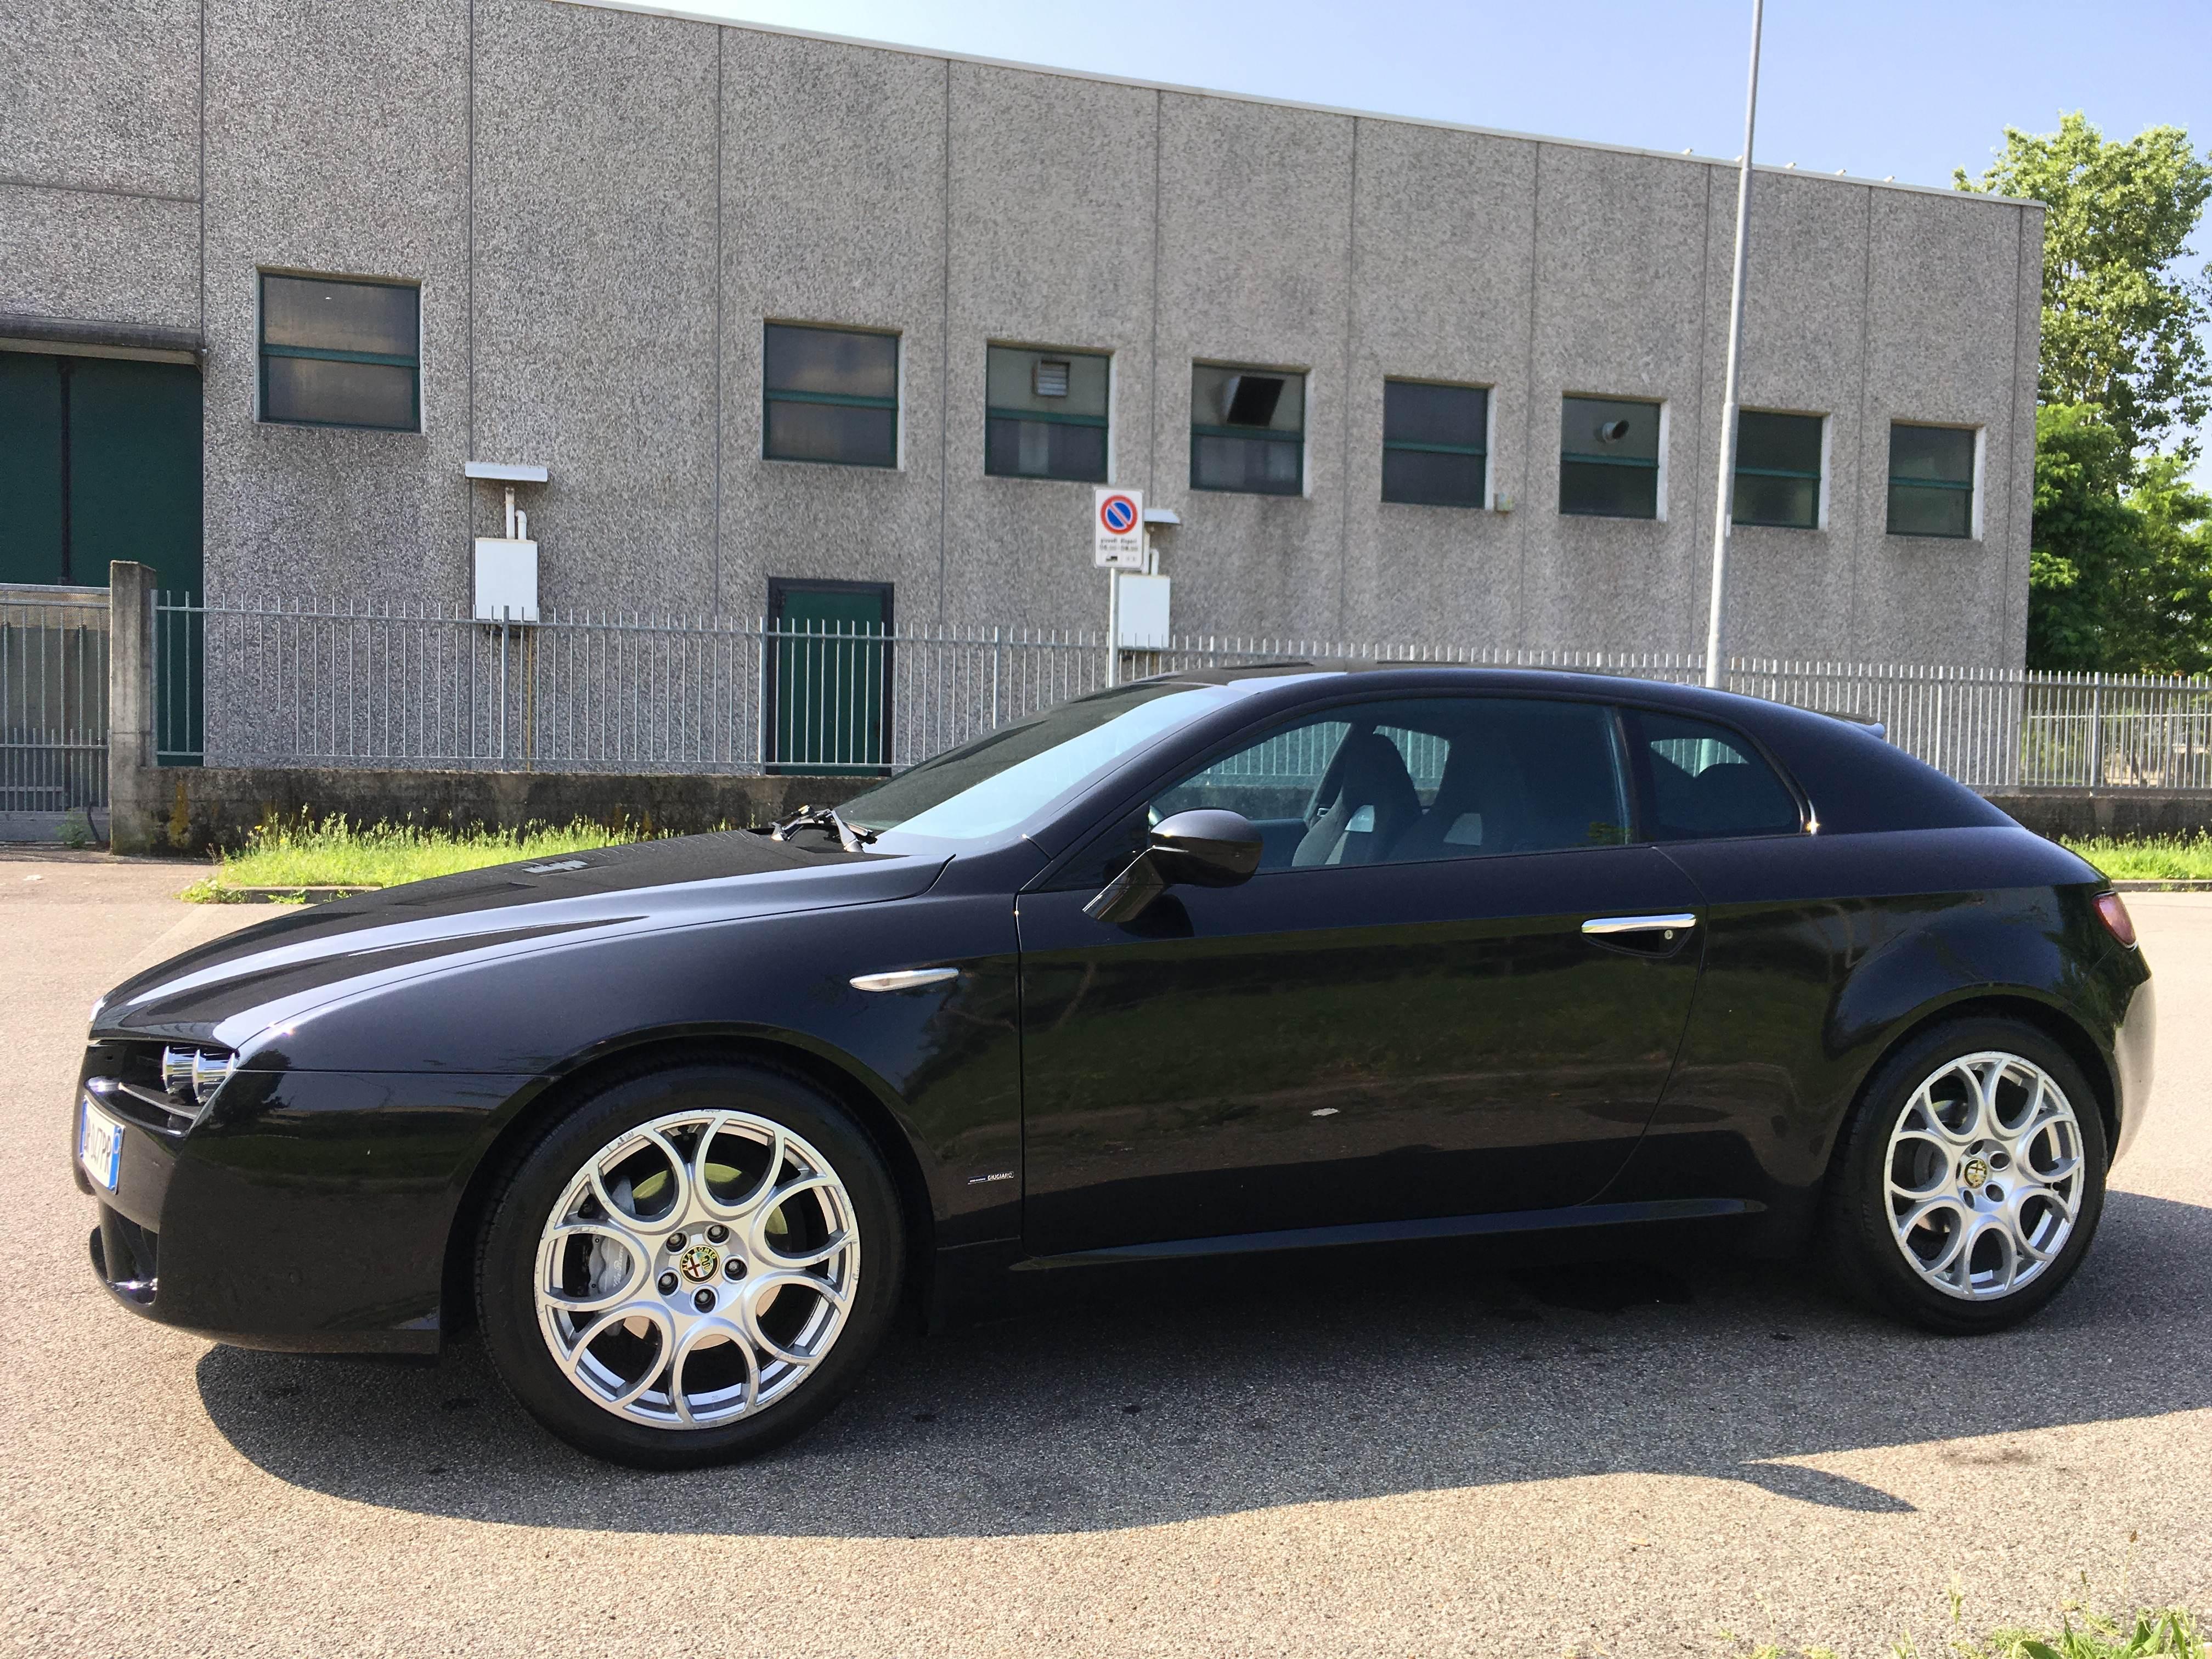 foto Alfa Romeo Brera - 2.2 jts 185cv - Nero - 2008 - MB - - 2